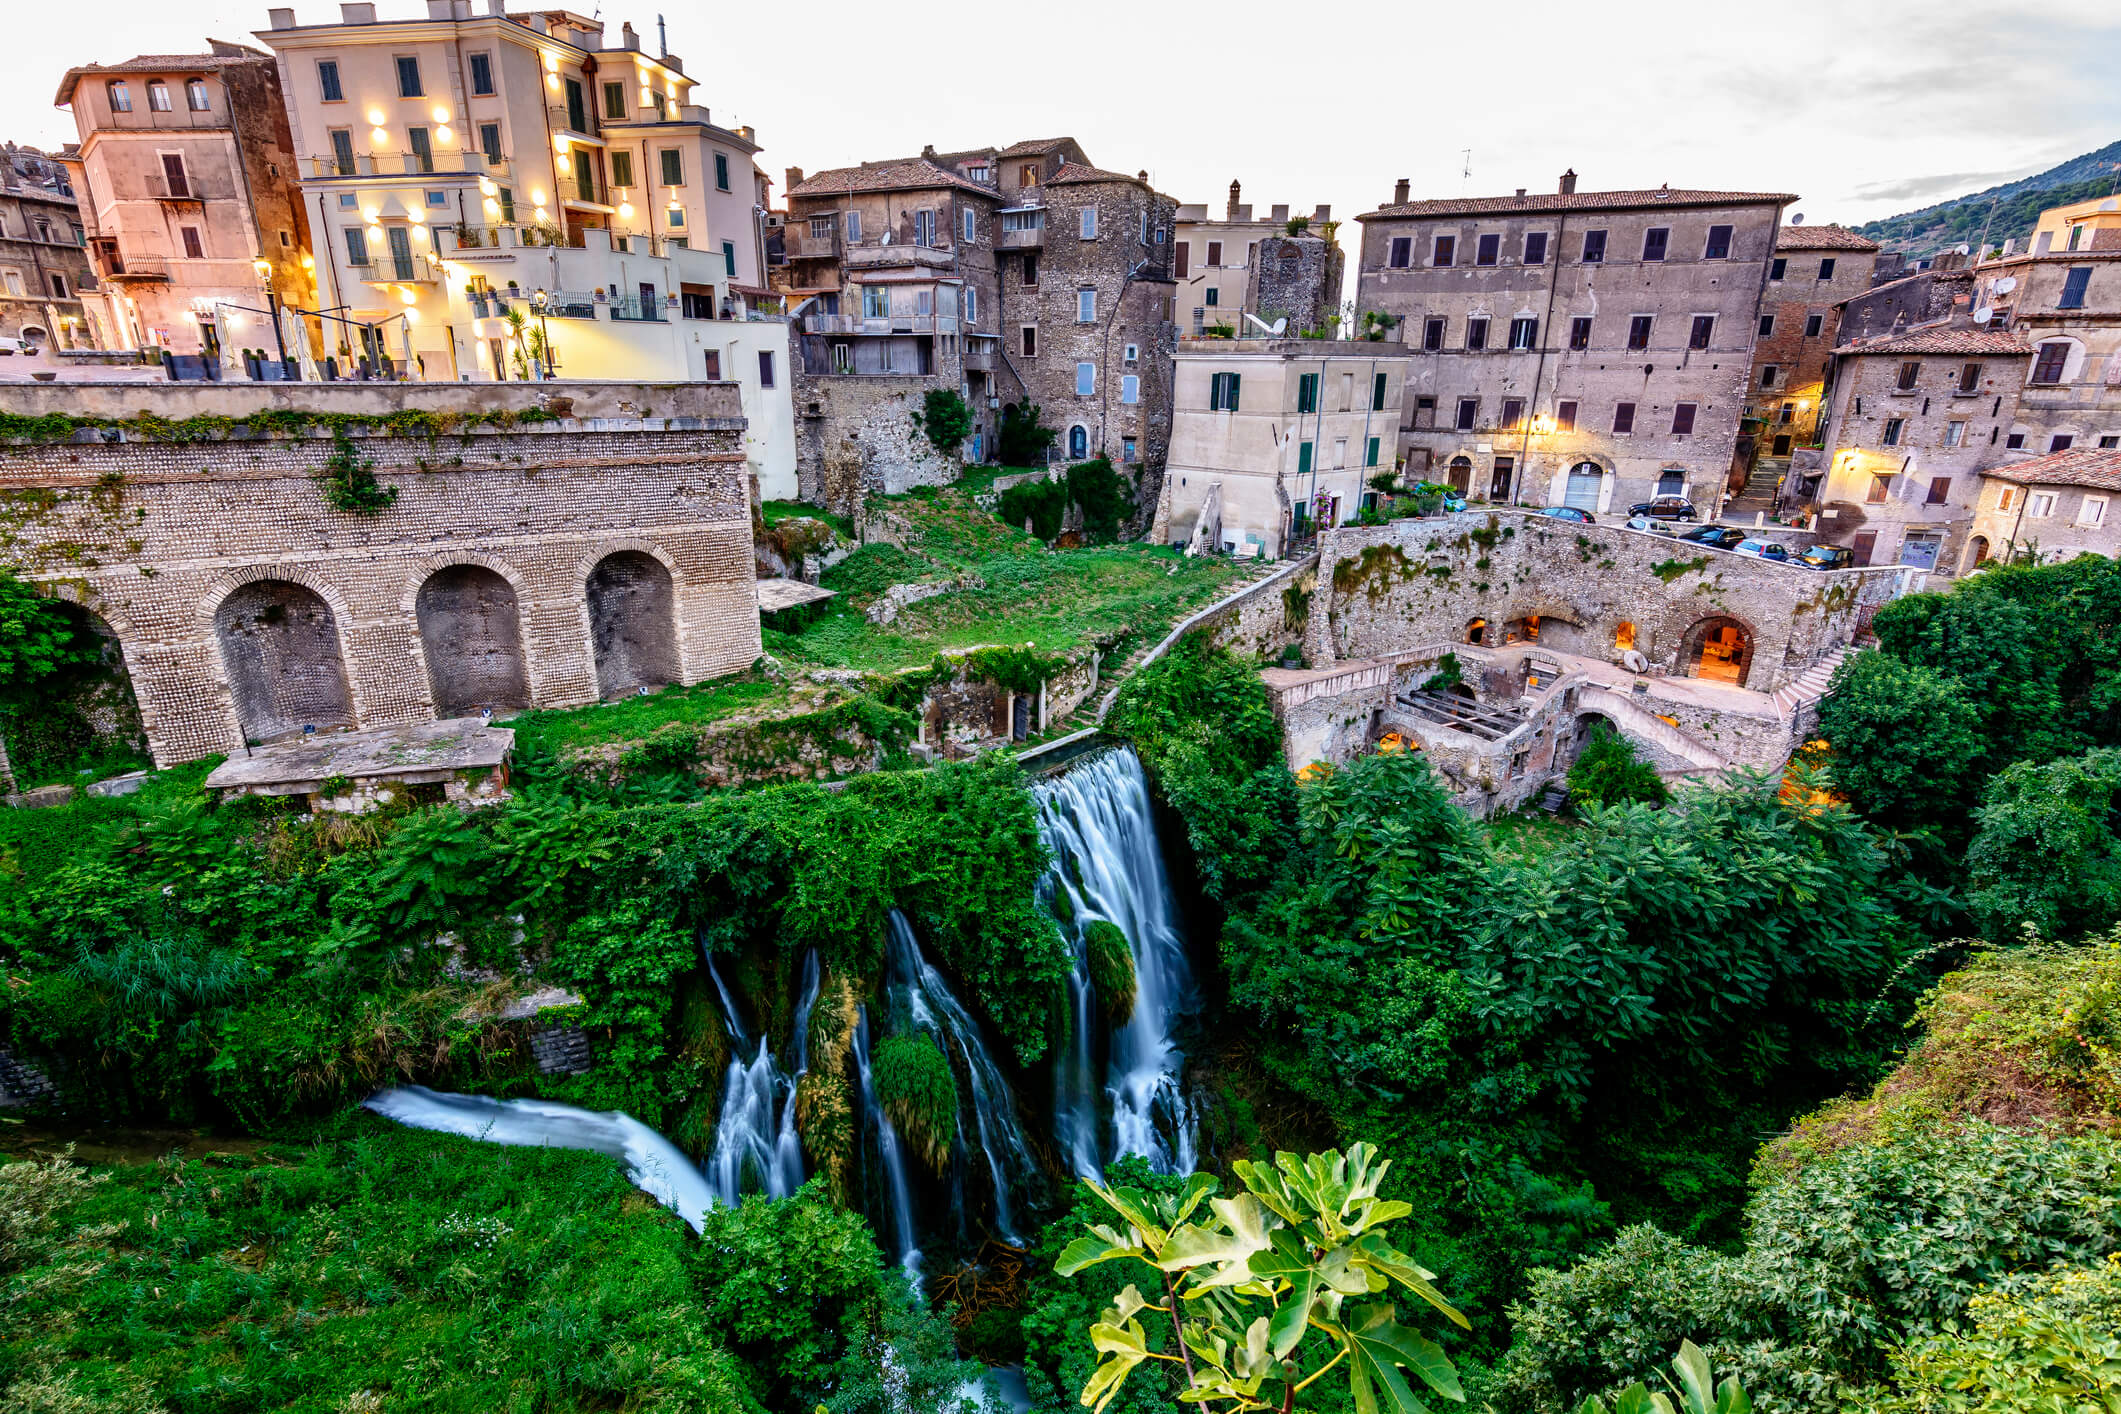 Dintorni di Roma: Villa Gregoriana a Tivoli - SenzaBarcode